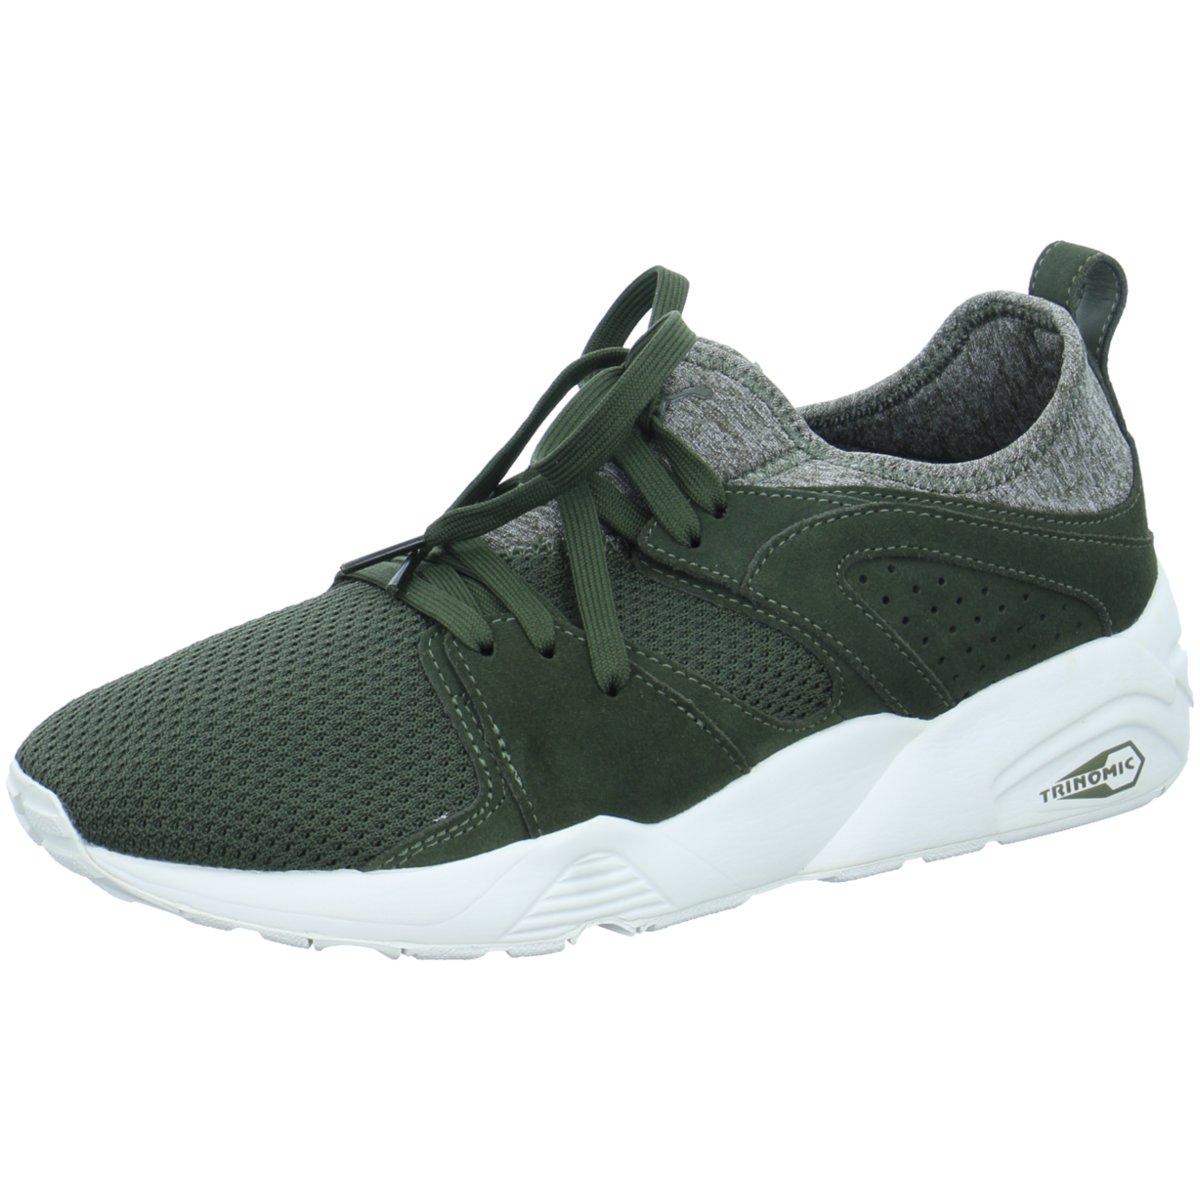 NEU Puma Herren Sneaker Sneaker Low Blaze CT 363749-004 oliv 353864